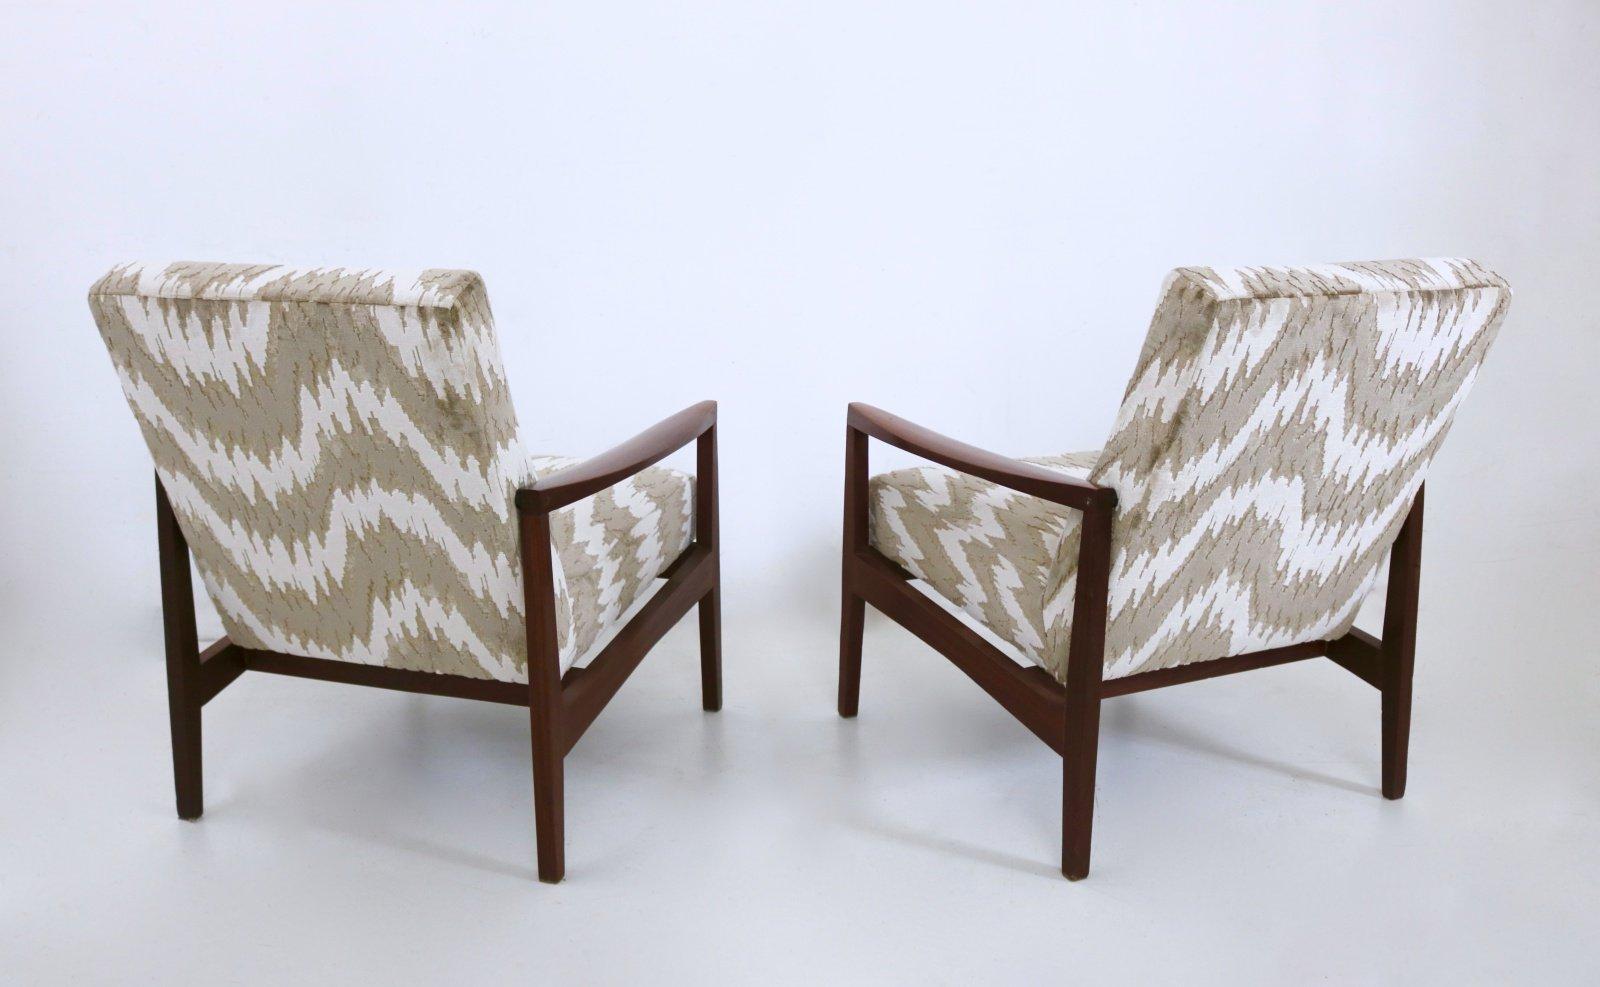 italienische sessel mit gemustertem stoffbezug 1950er. Black Bedroom Furniture Sets. Home Design Ideas